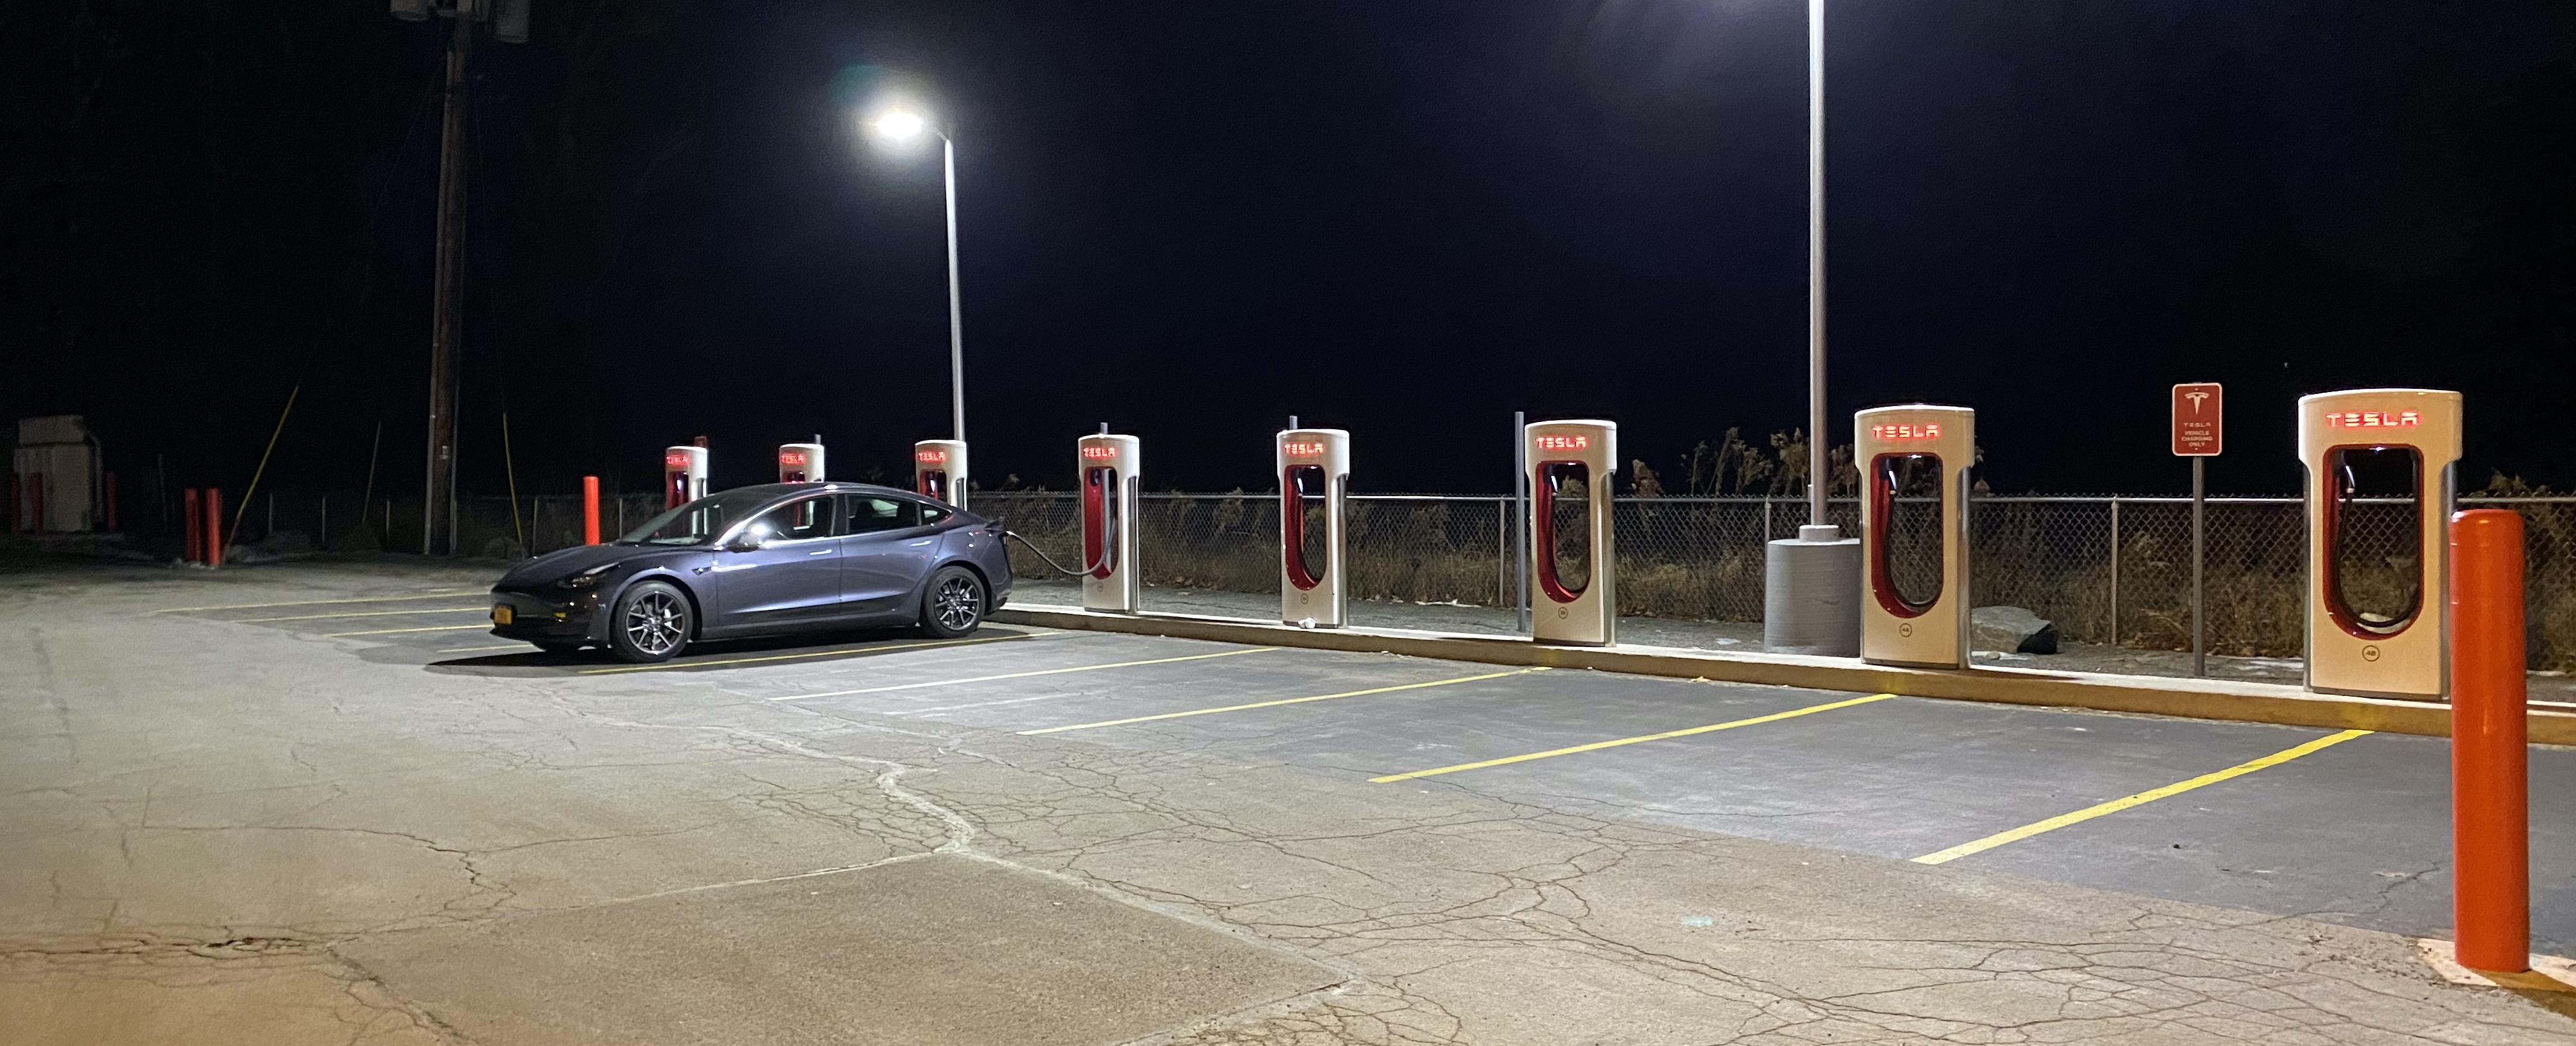 Tesla Model 3 Supercharging at Night Alone